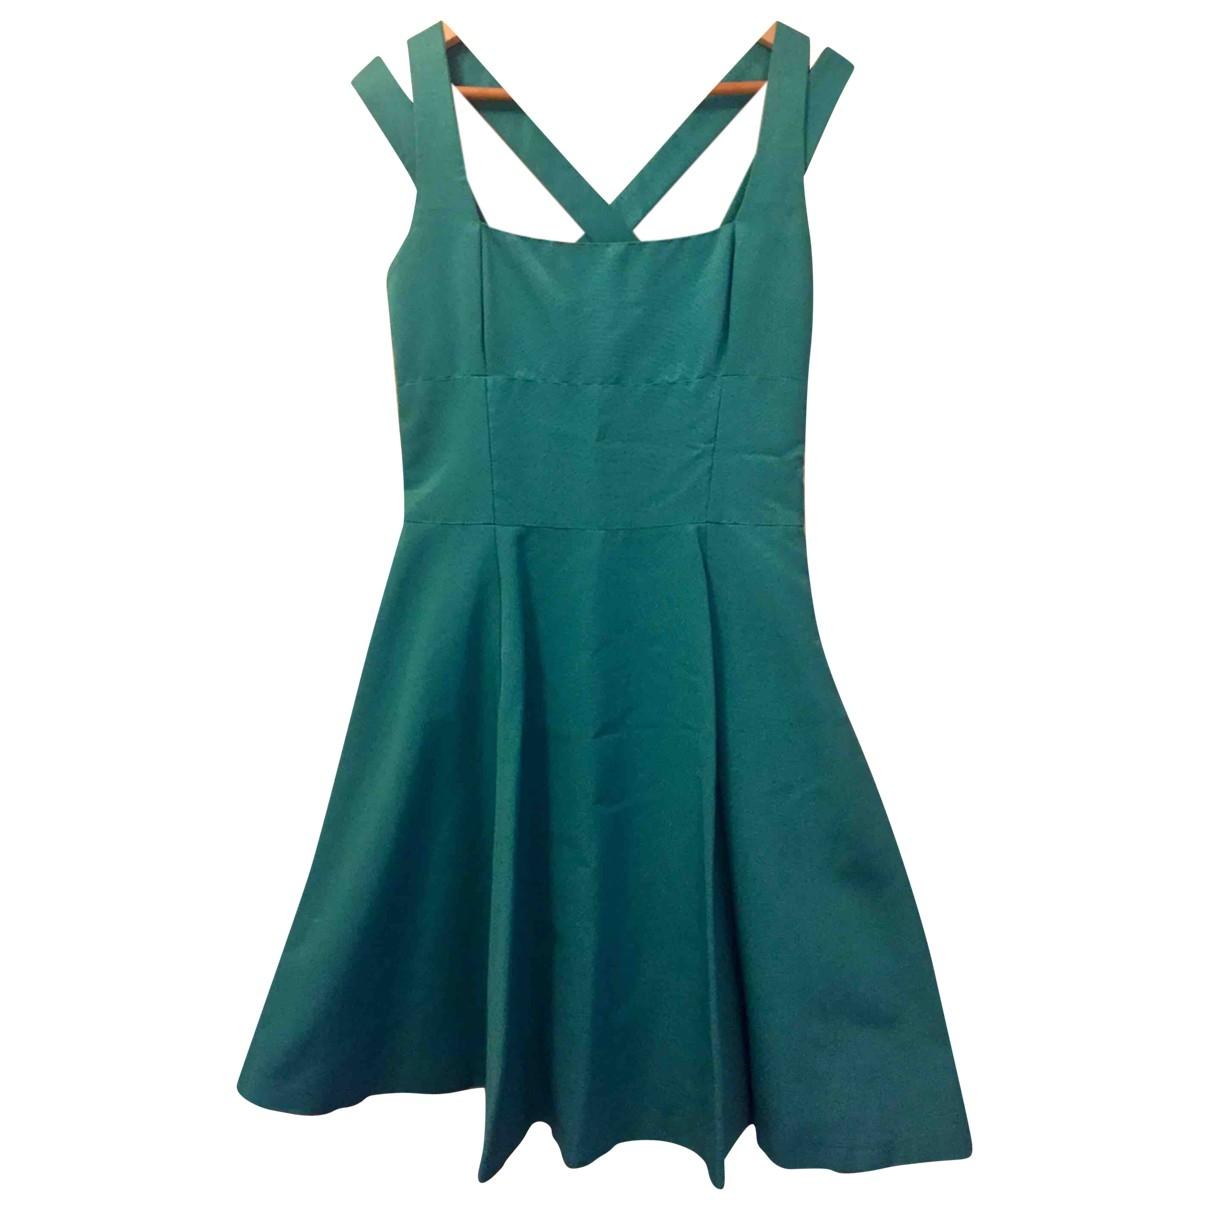 Reiss \N Green Cotton dress for Women 10 UK